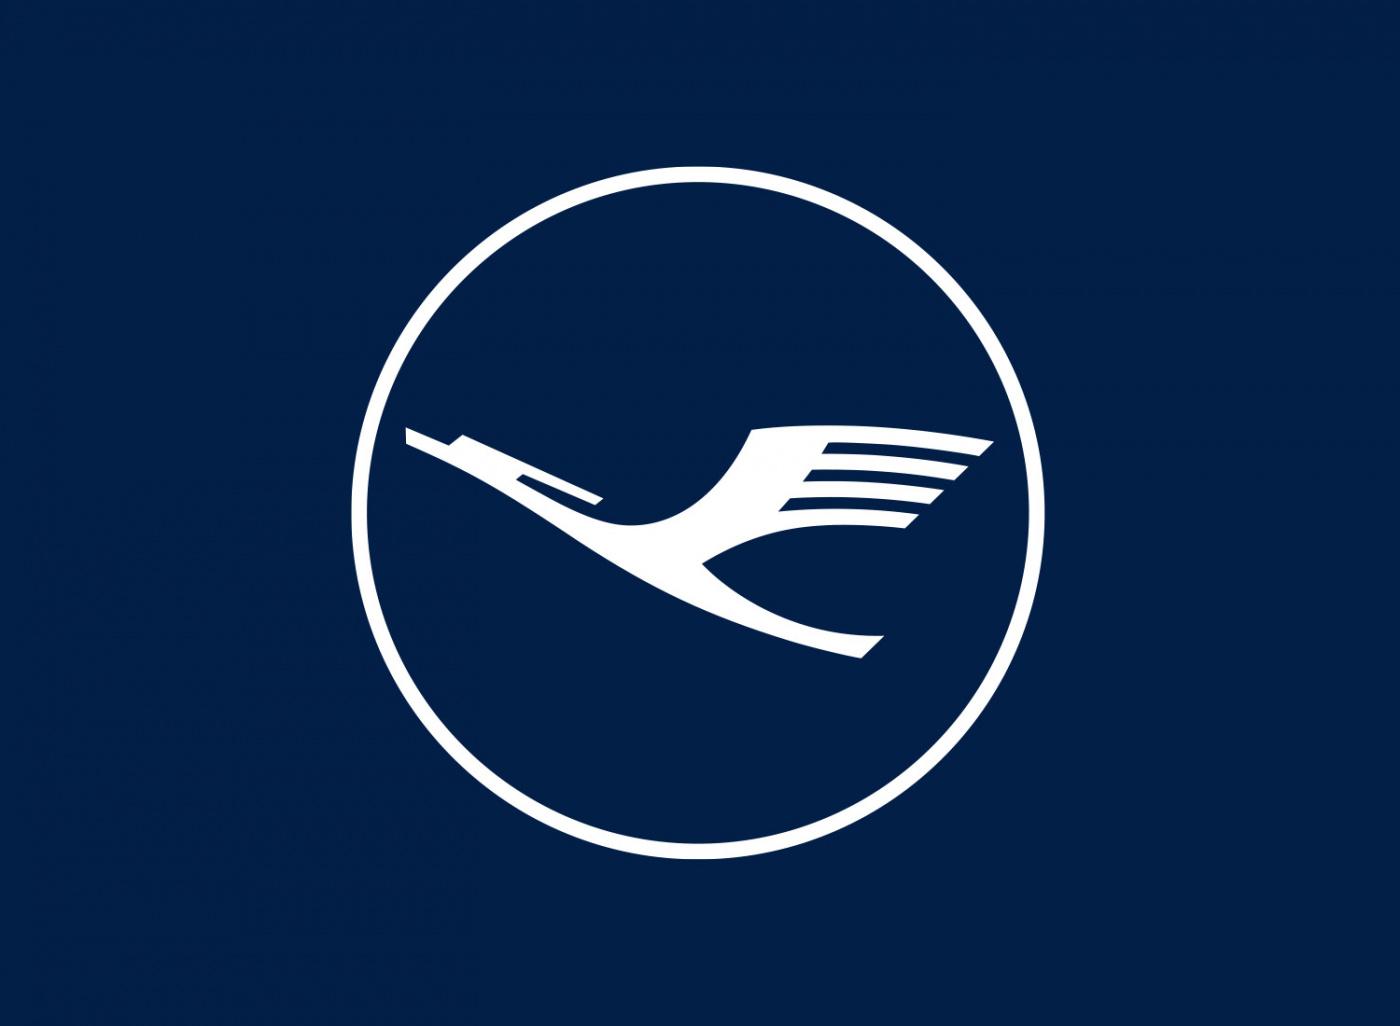 Why Lufthansa Gave Its Brand Design A Refresh